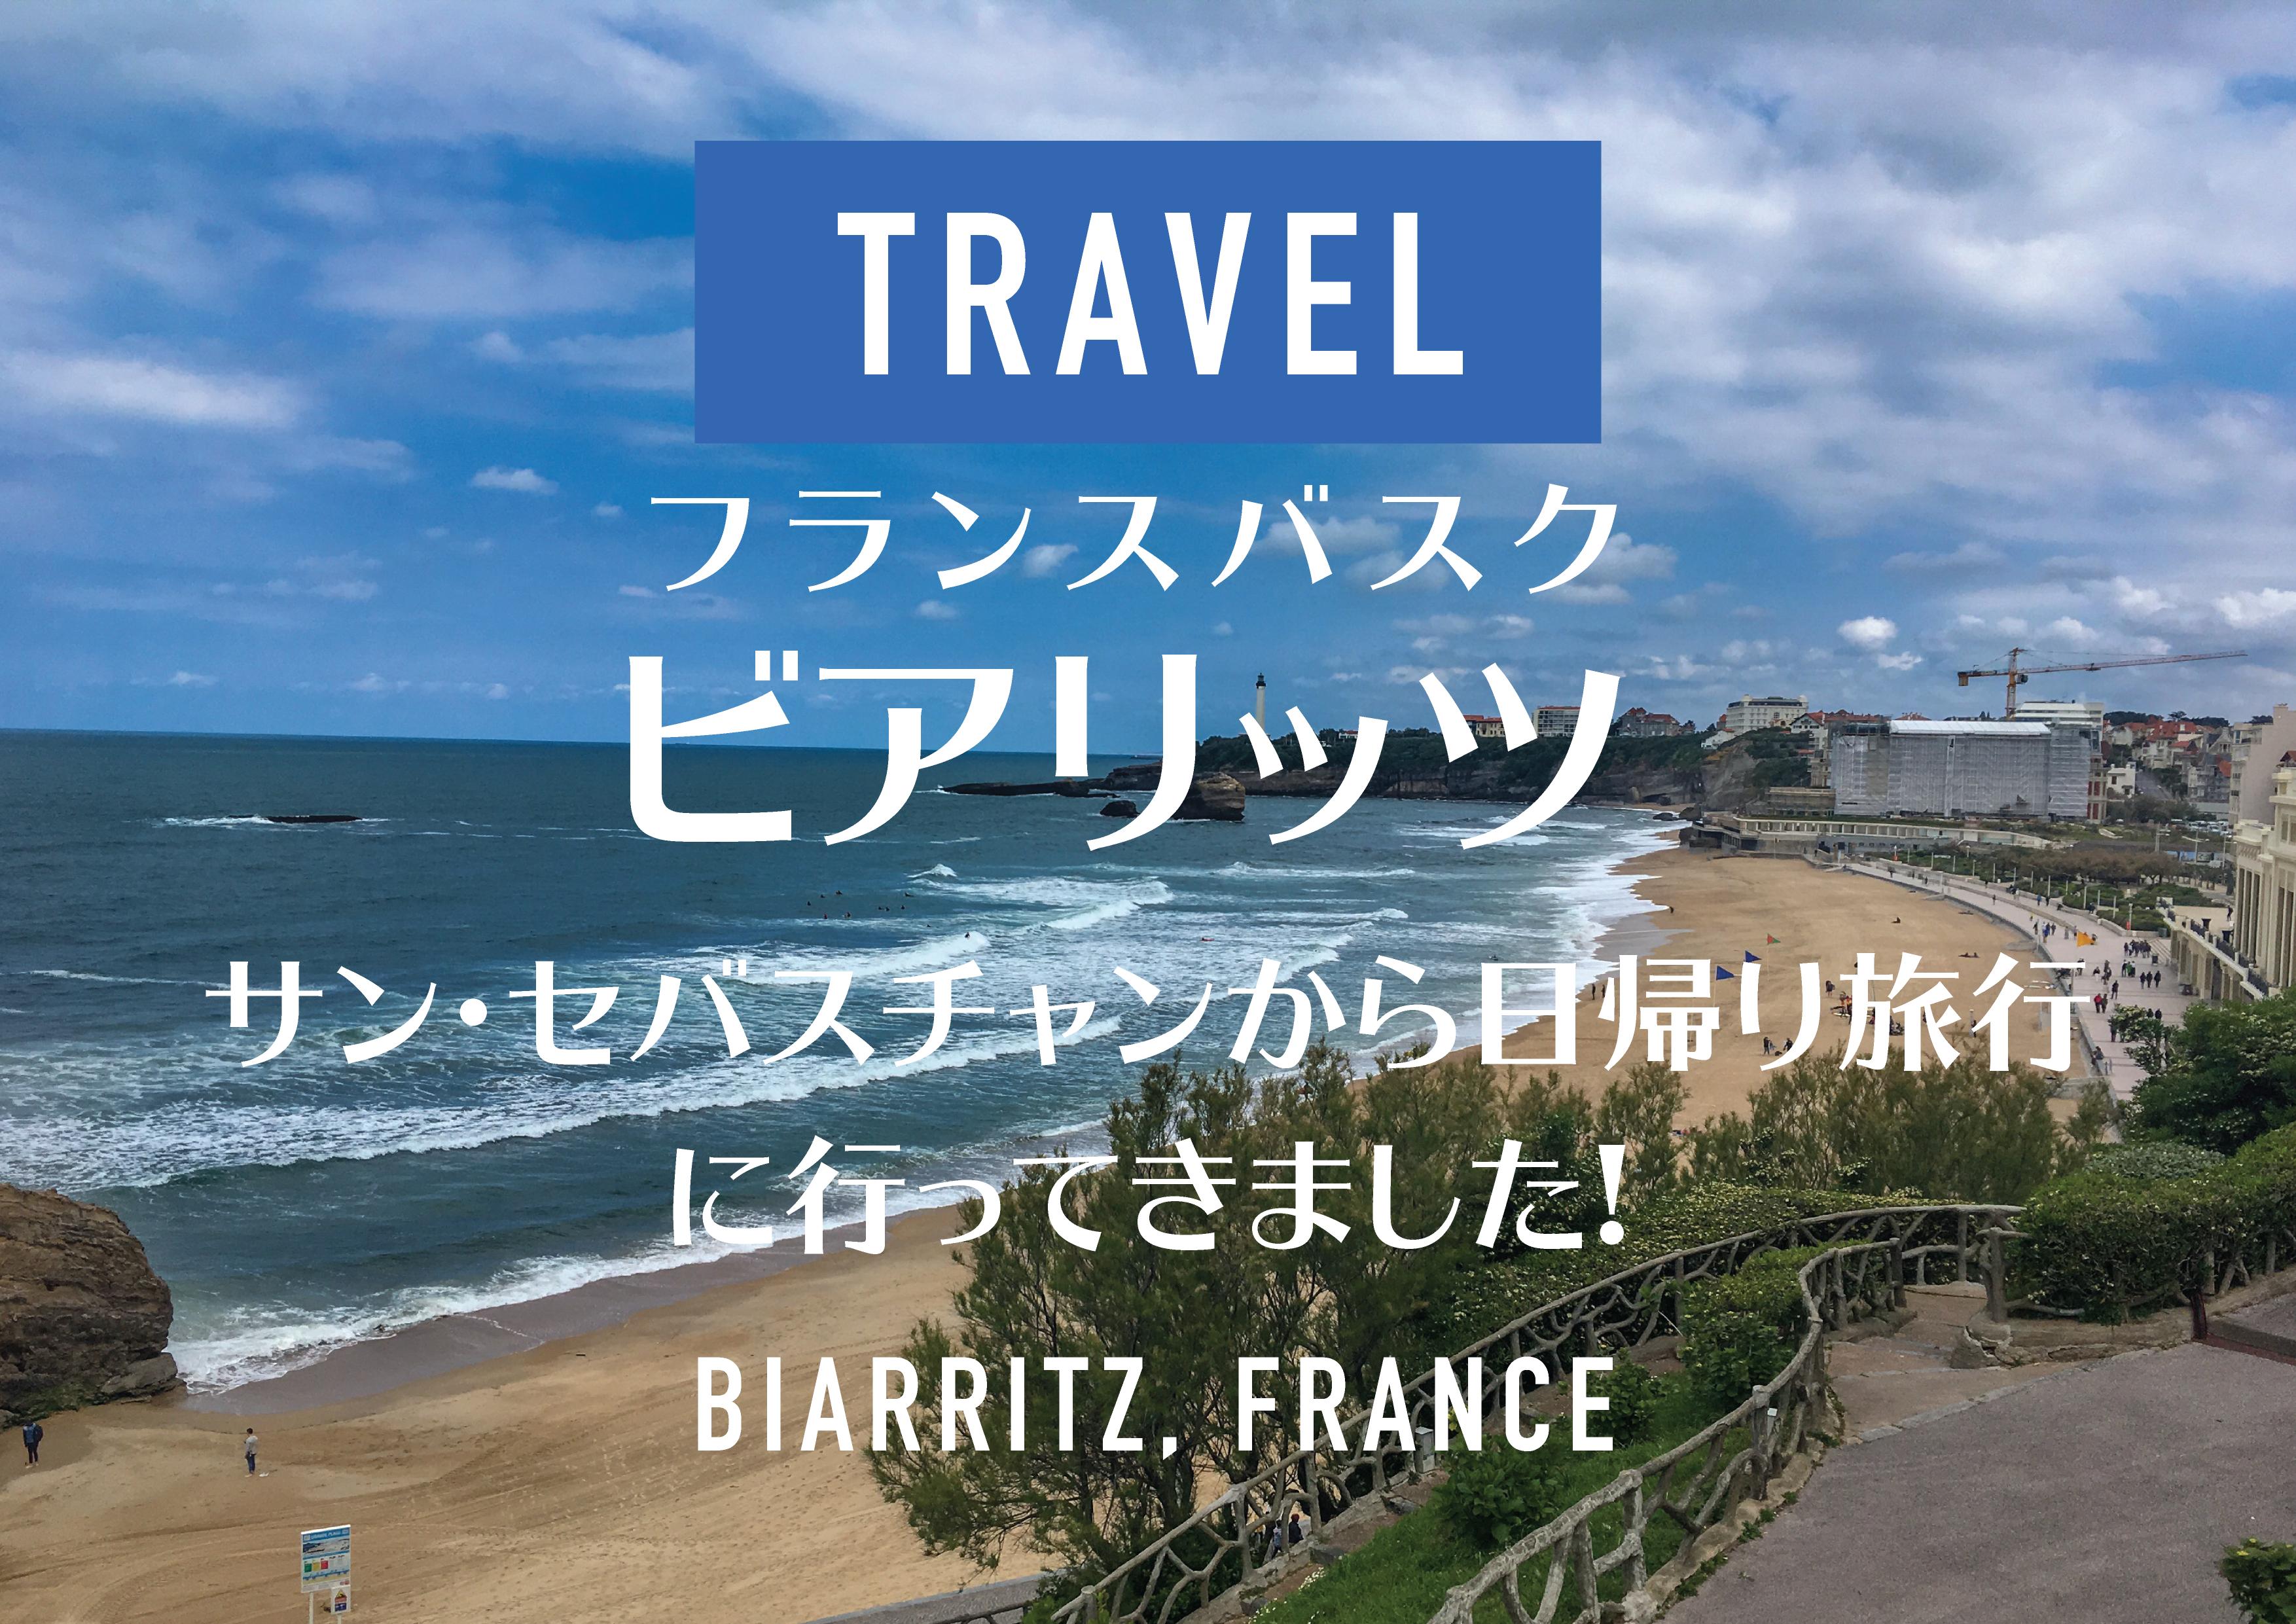 BiarritzDayTrip 01